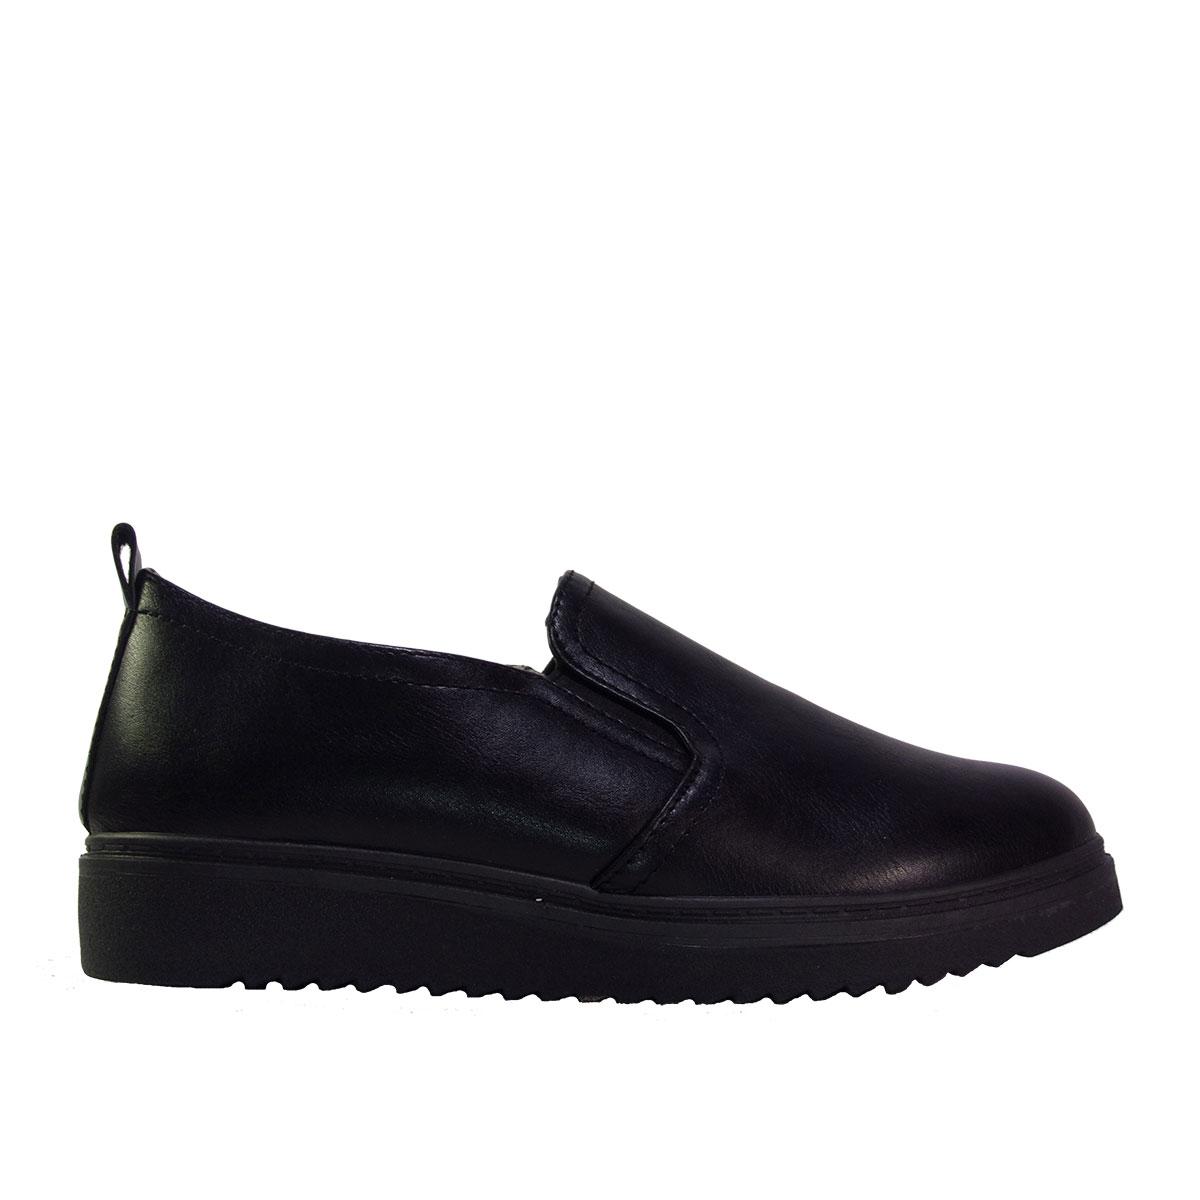 ed4cdf9a4c7 ILoveMyShoes B-512 Γυναικεία Παπούτσια Loafers Δέρμα Μαύρο